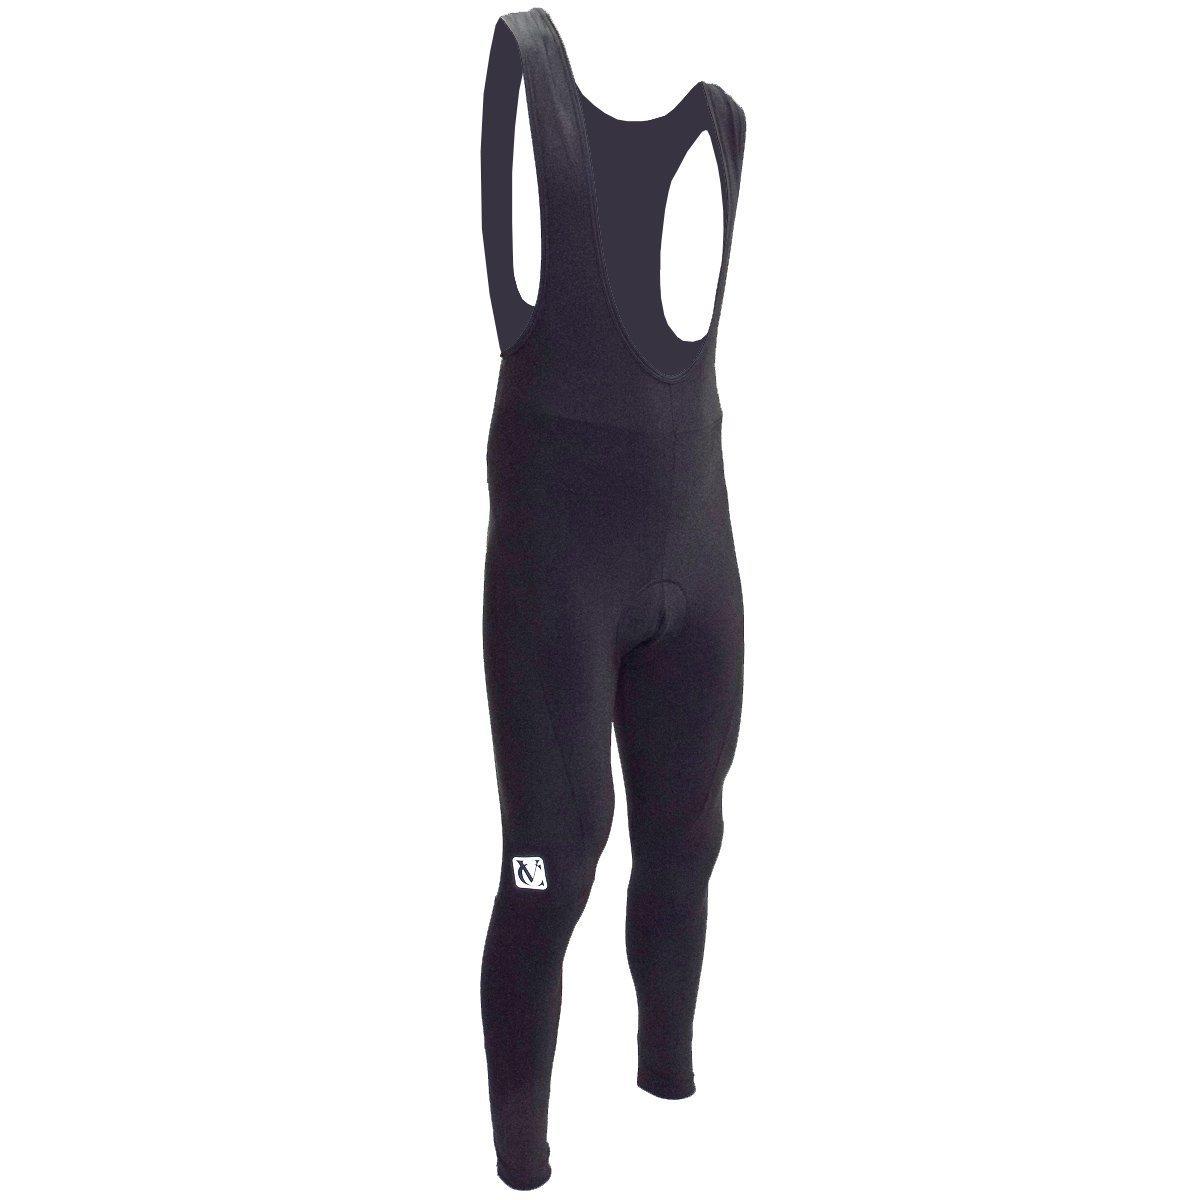 Beliebt Amazon.fr : Cuissards - Pantalons de cycliste : Sports et Loisirs TS53